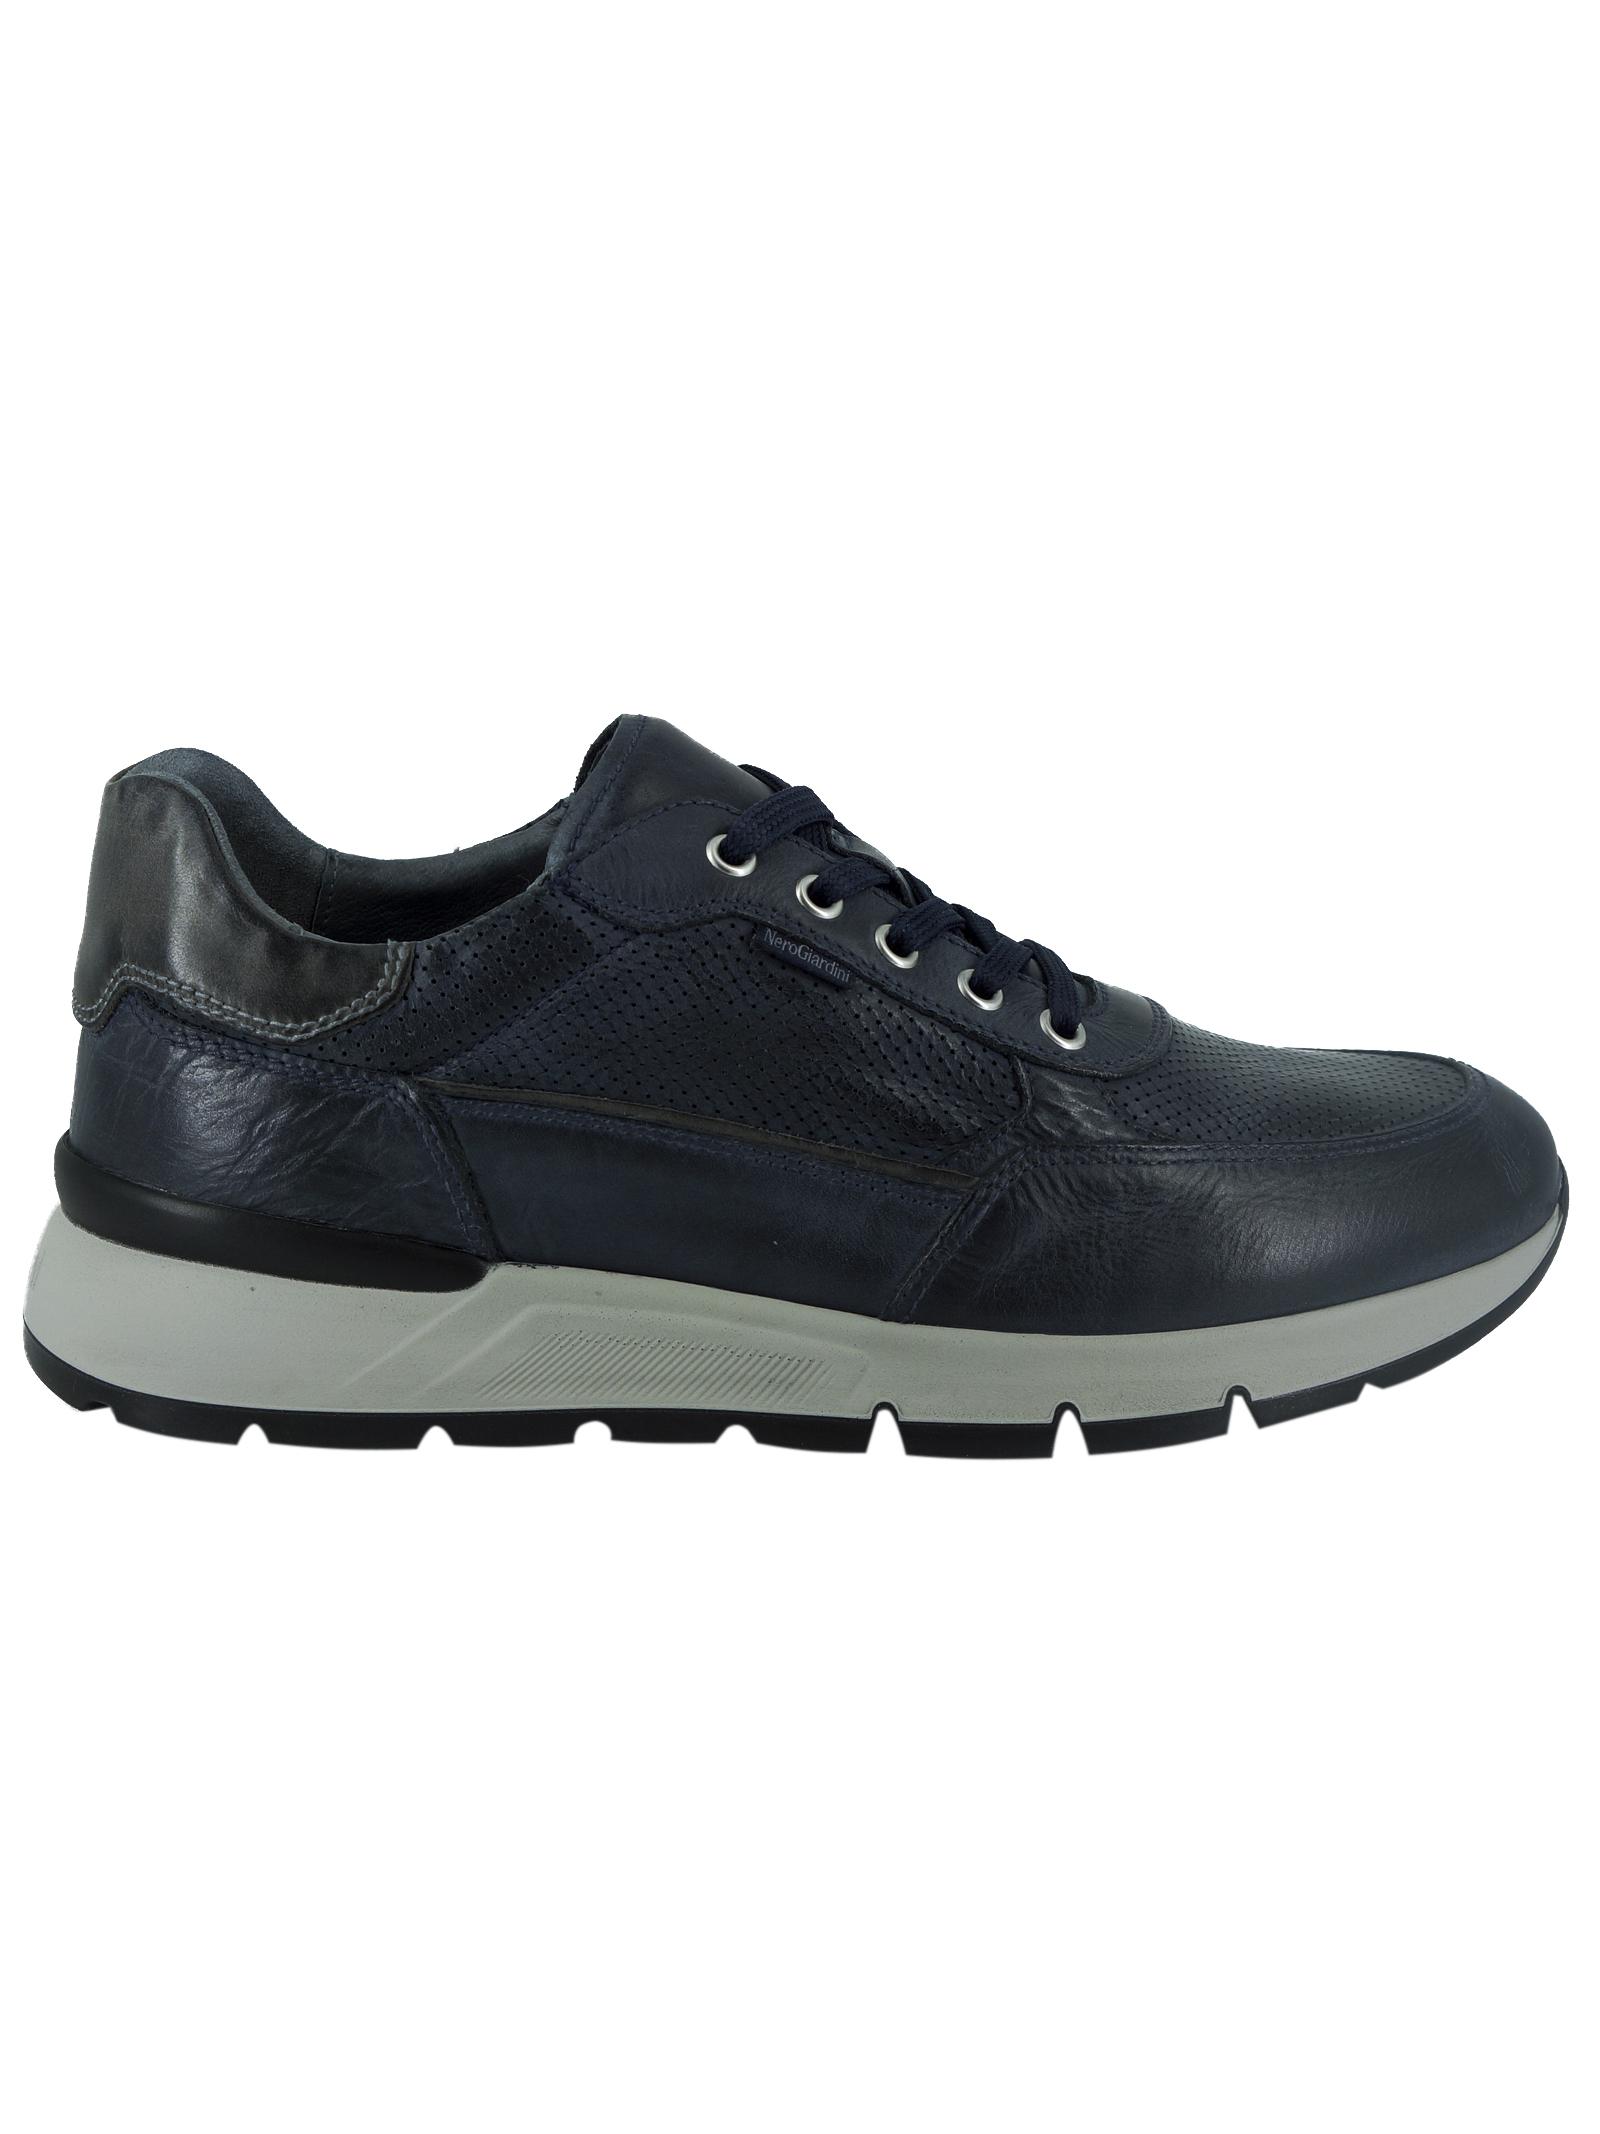 Sneakers Uomo in Pelle Nero Giardini Nero Giardini | Sneakers | E101991UBLU200